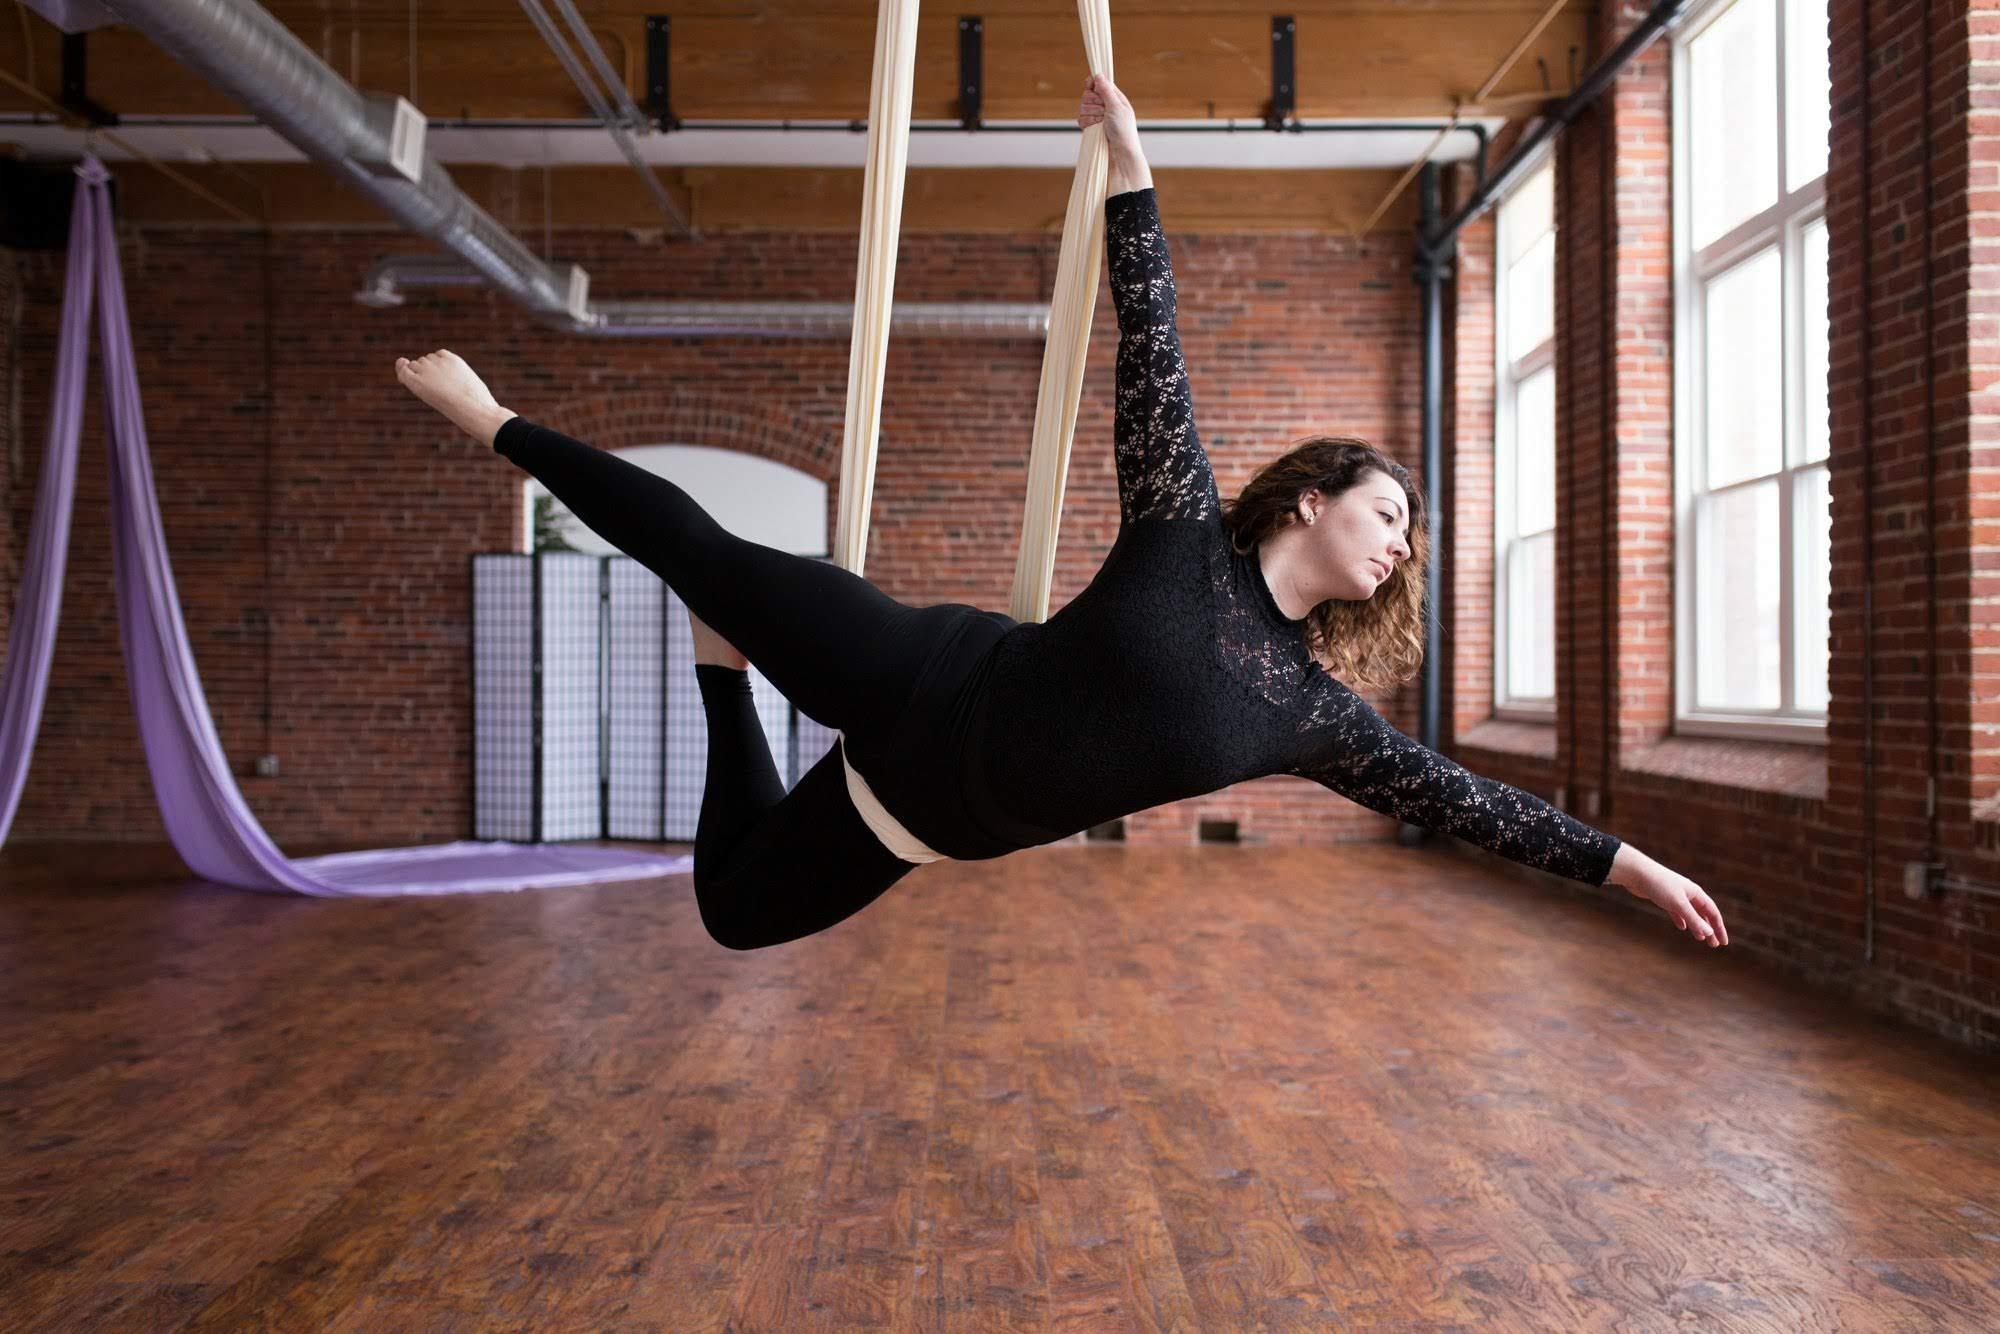 Aerial yoga studio fitness circus silks studio class classes manchester nh new hampshire karlene linxweiler best of nh